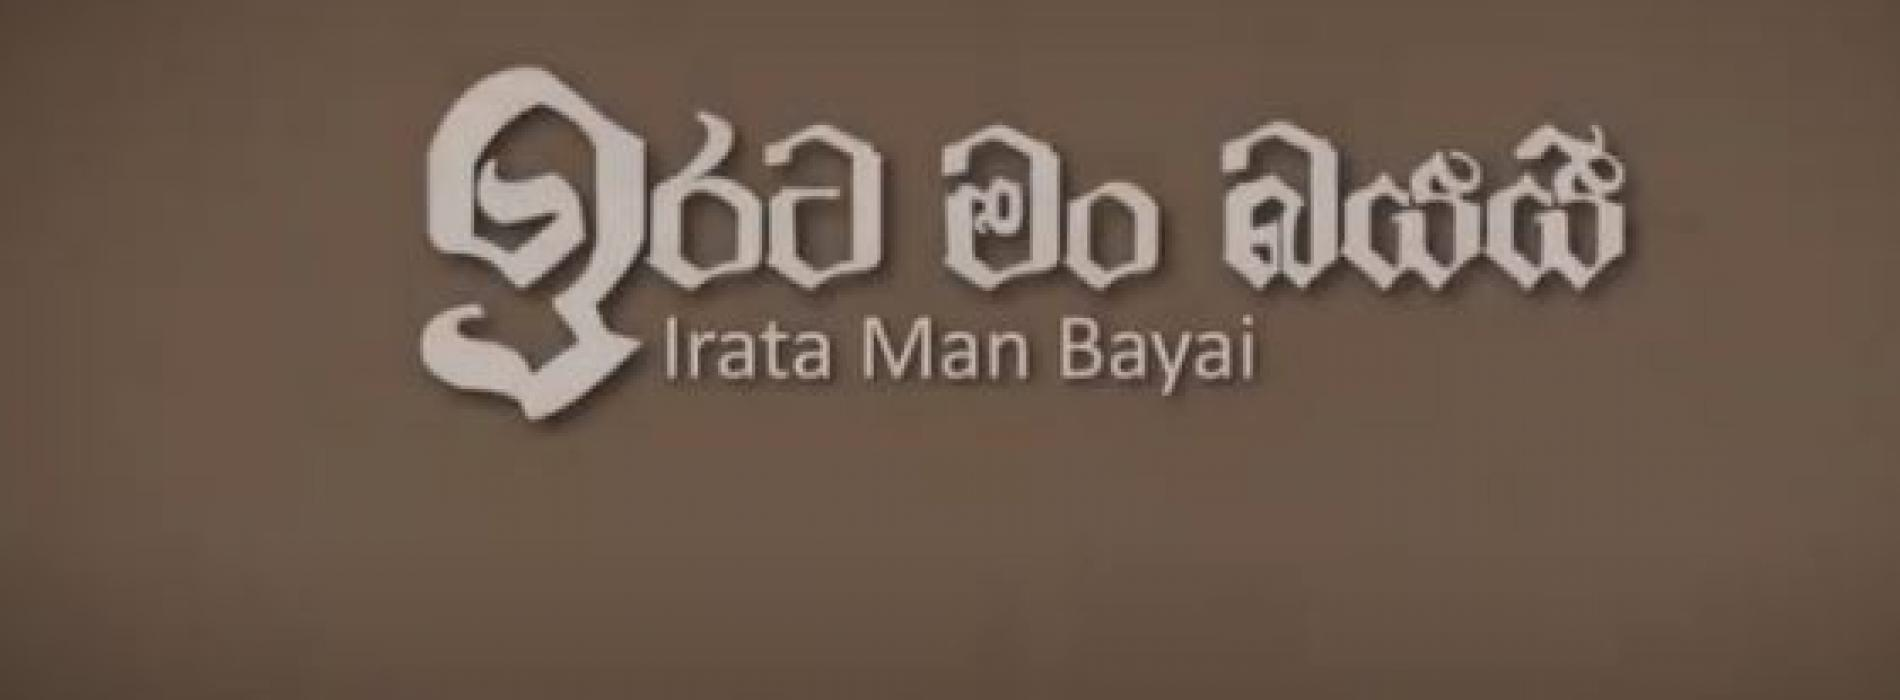 New Music : Jinna – Irata Man Bayai ( ඉරට මං බයයි )